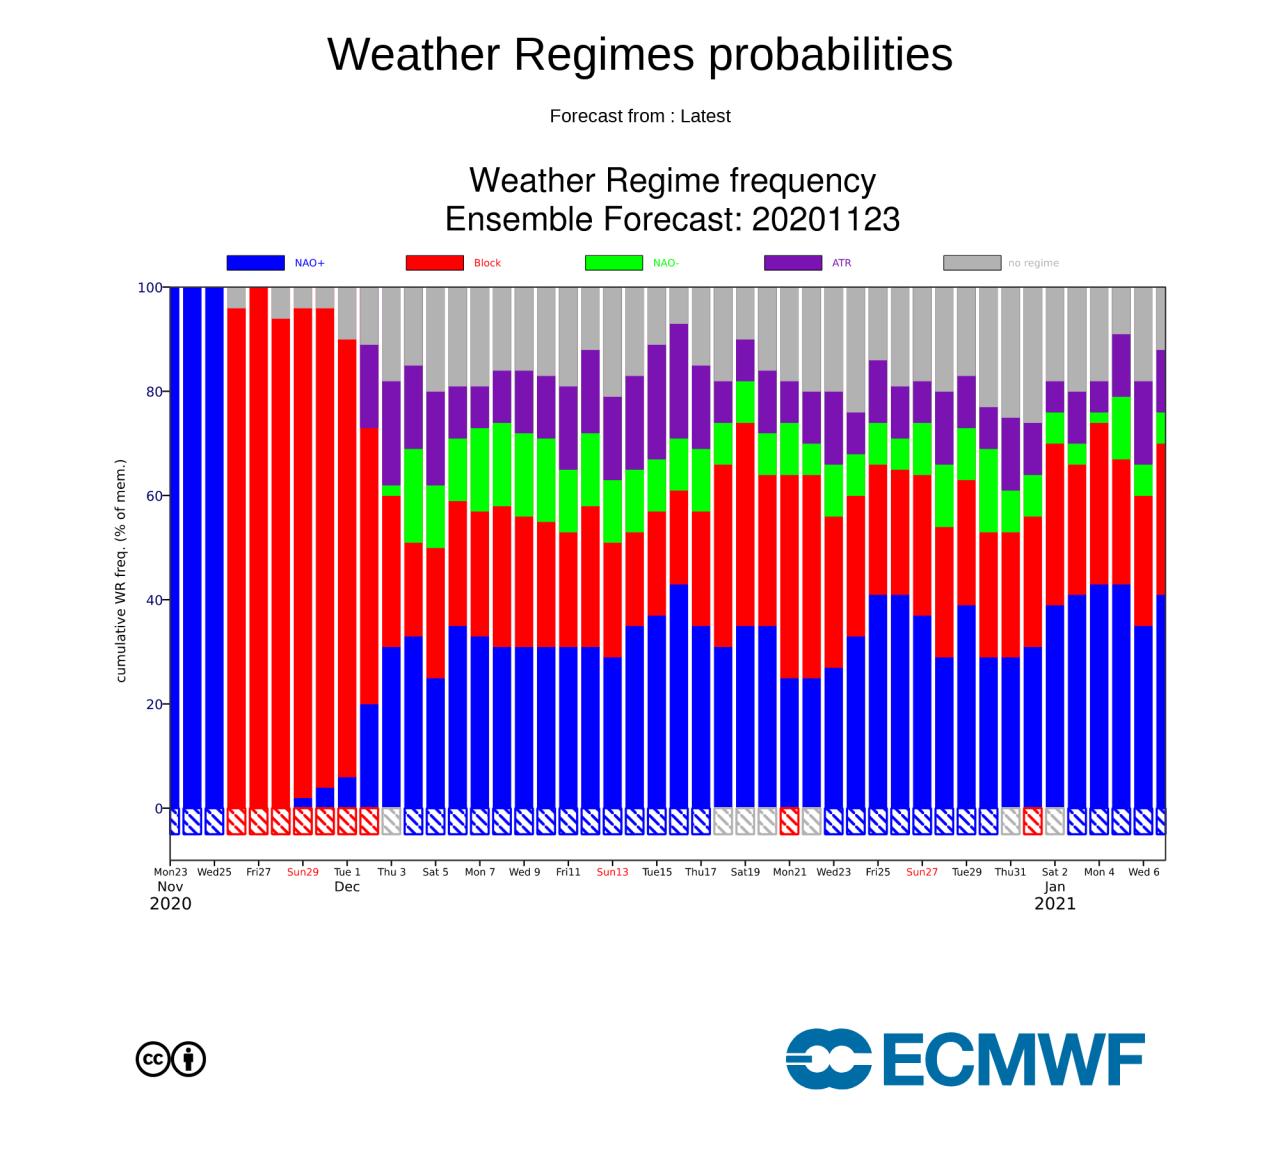 Frequenza dei sistemi meteorologici di ecmwf